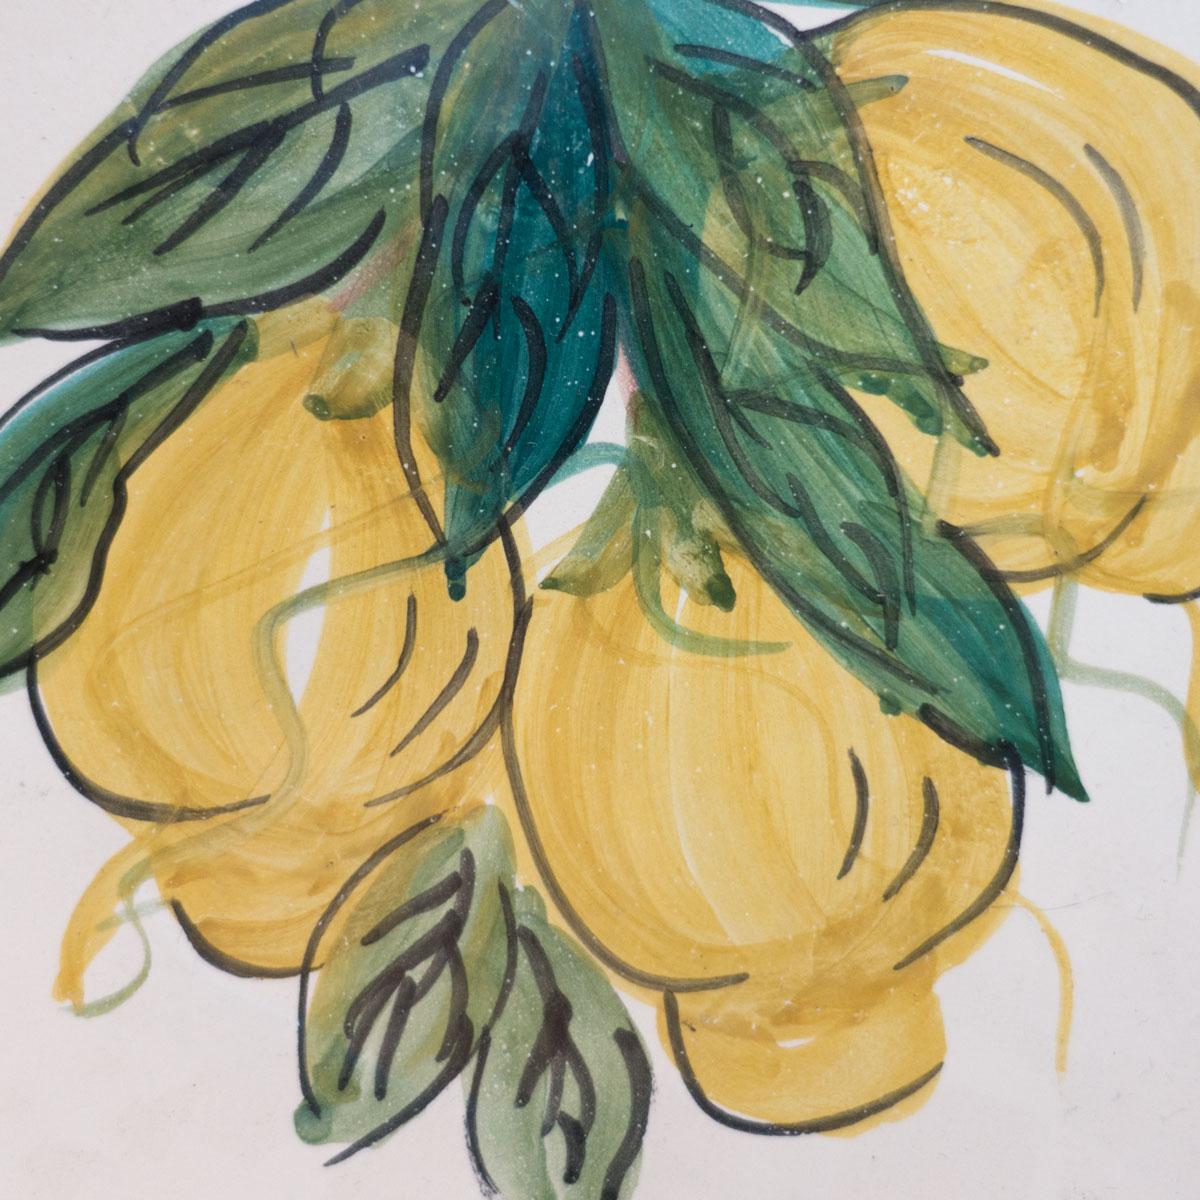 DECORATO. I limoni